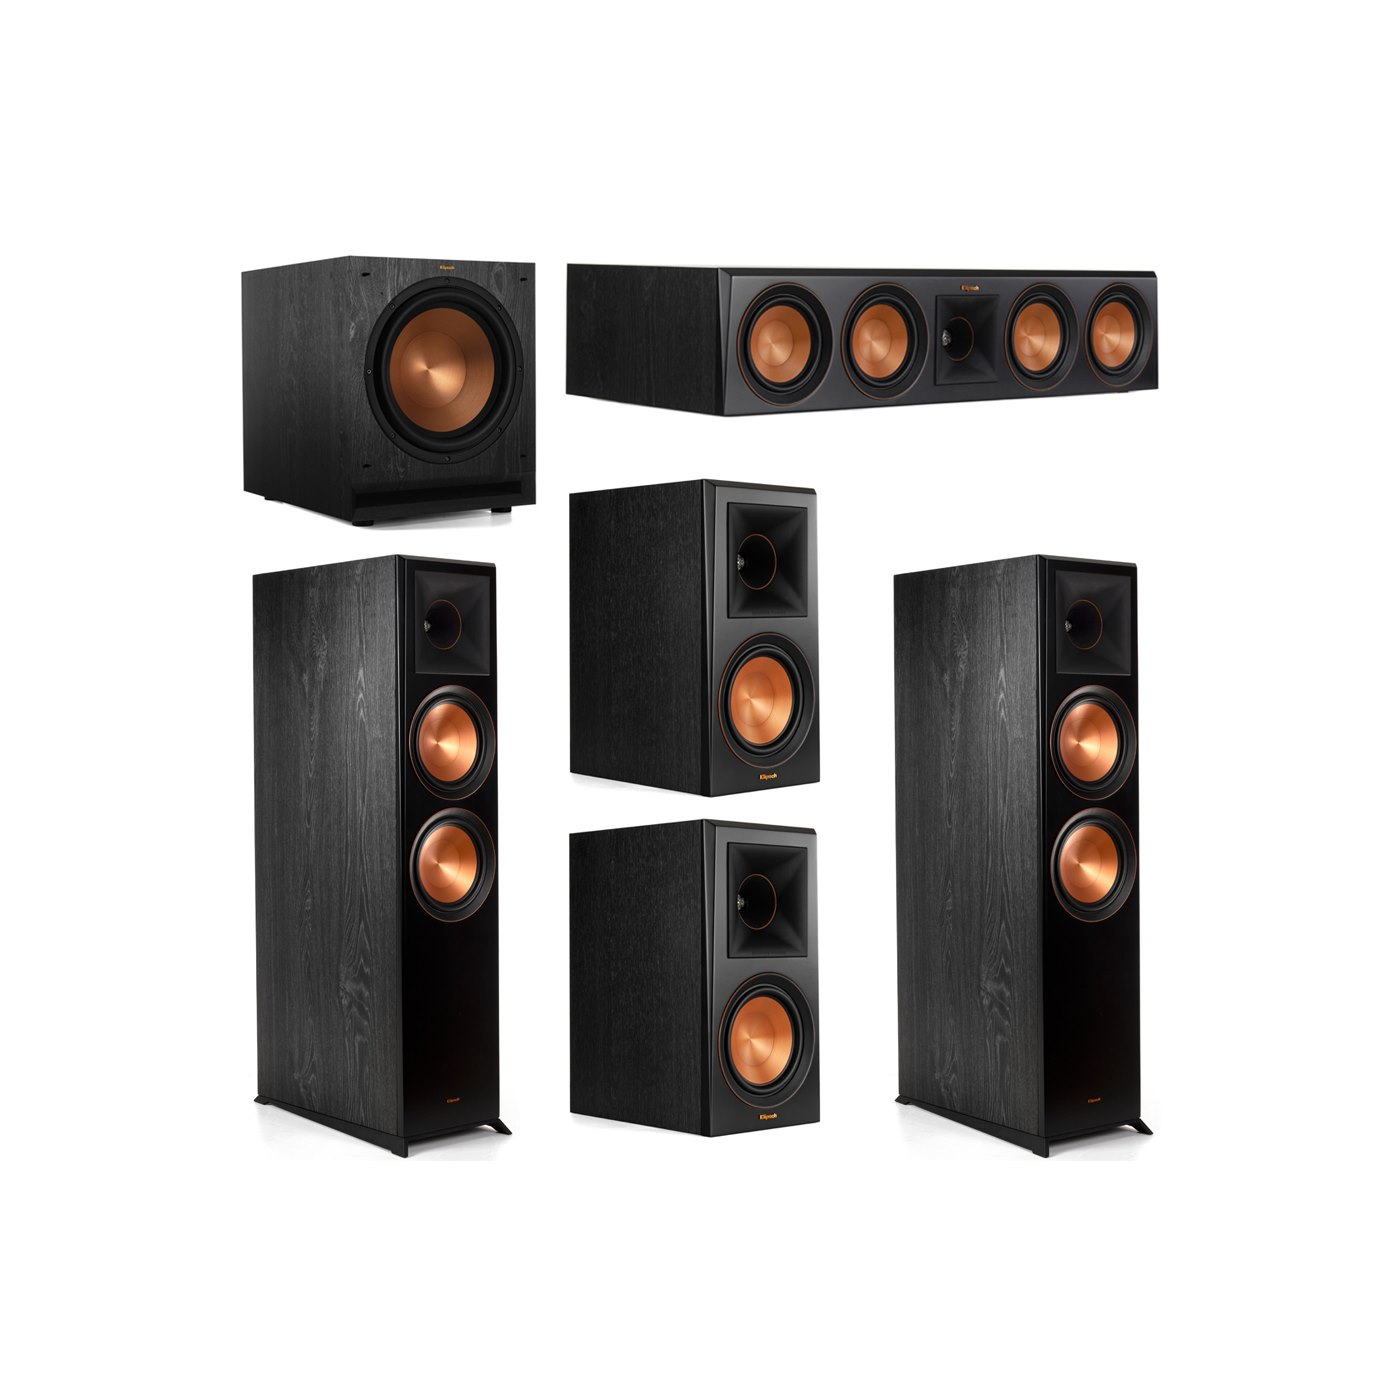 Klipsch 5.1 System with 2 RP-8000F Floorstanding Speakers, 1 Klipsch RP-504C Center Speaker, 2 Klipsch RP-600M Surround Speakers, 1 Klipsch SPL-120 Subwoofer